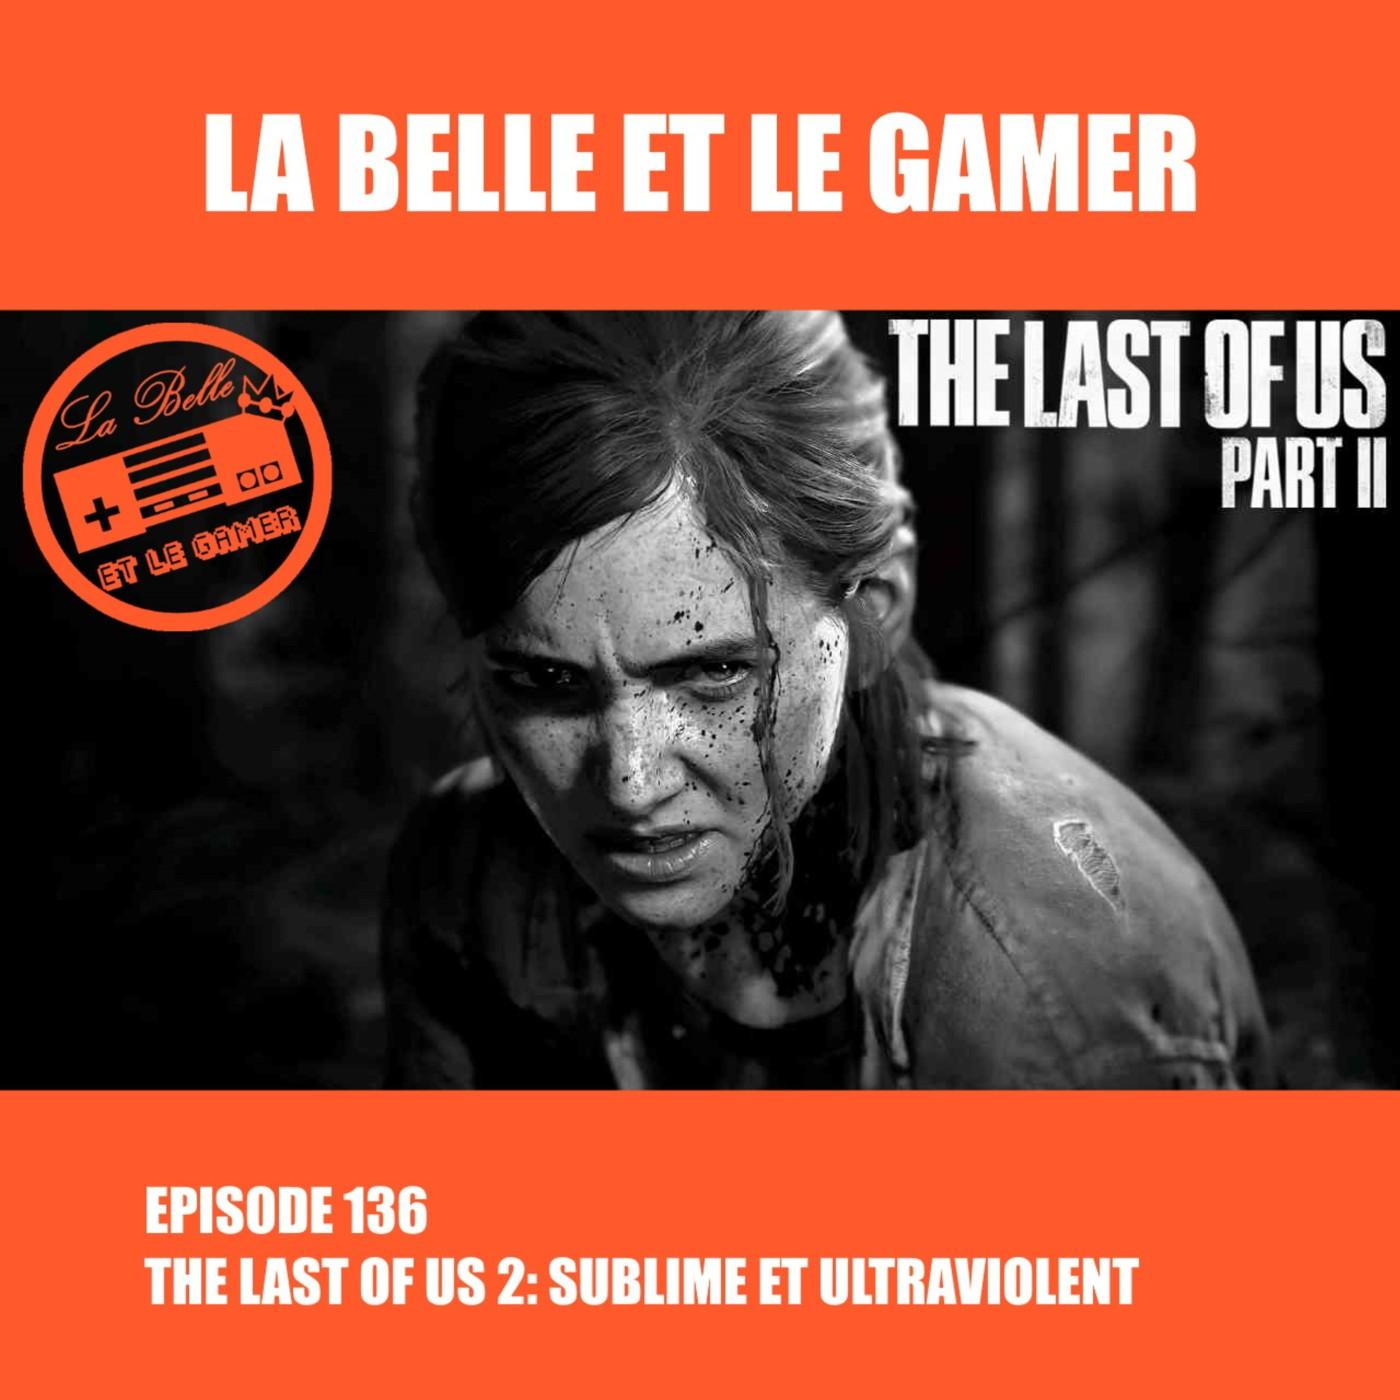 Episode 136: The Last of Us Part II: Sublime et Ultraviolent